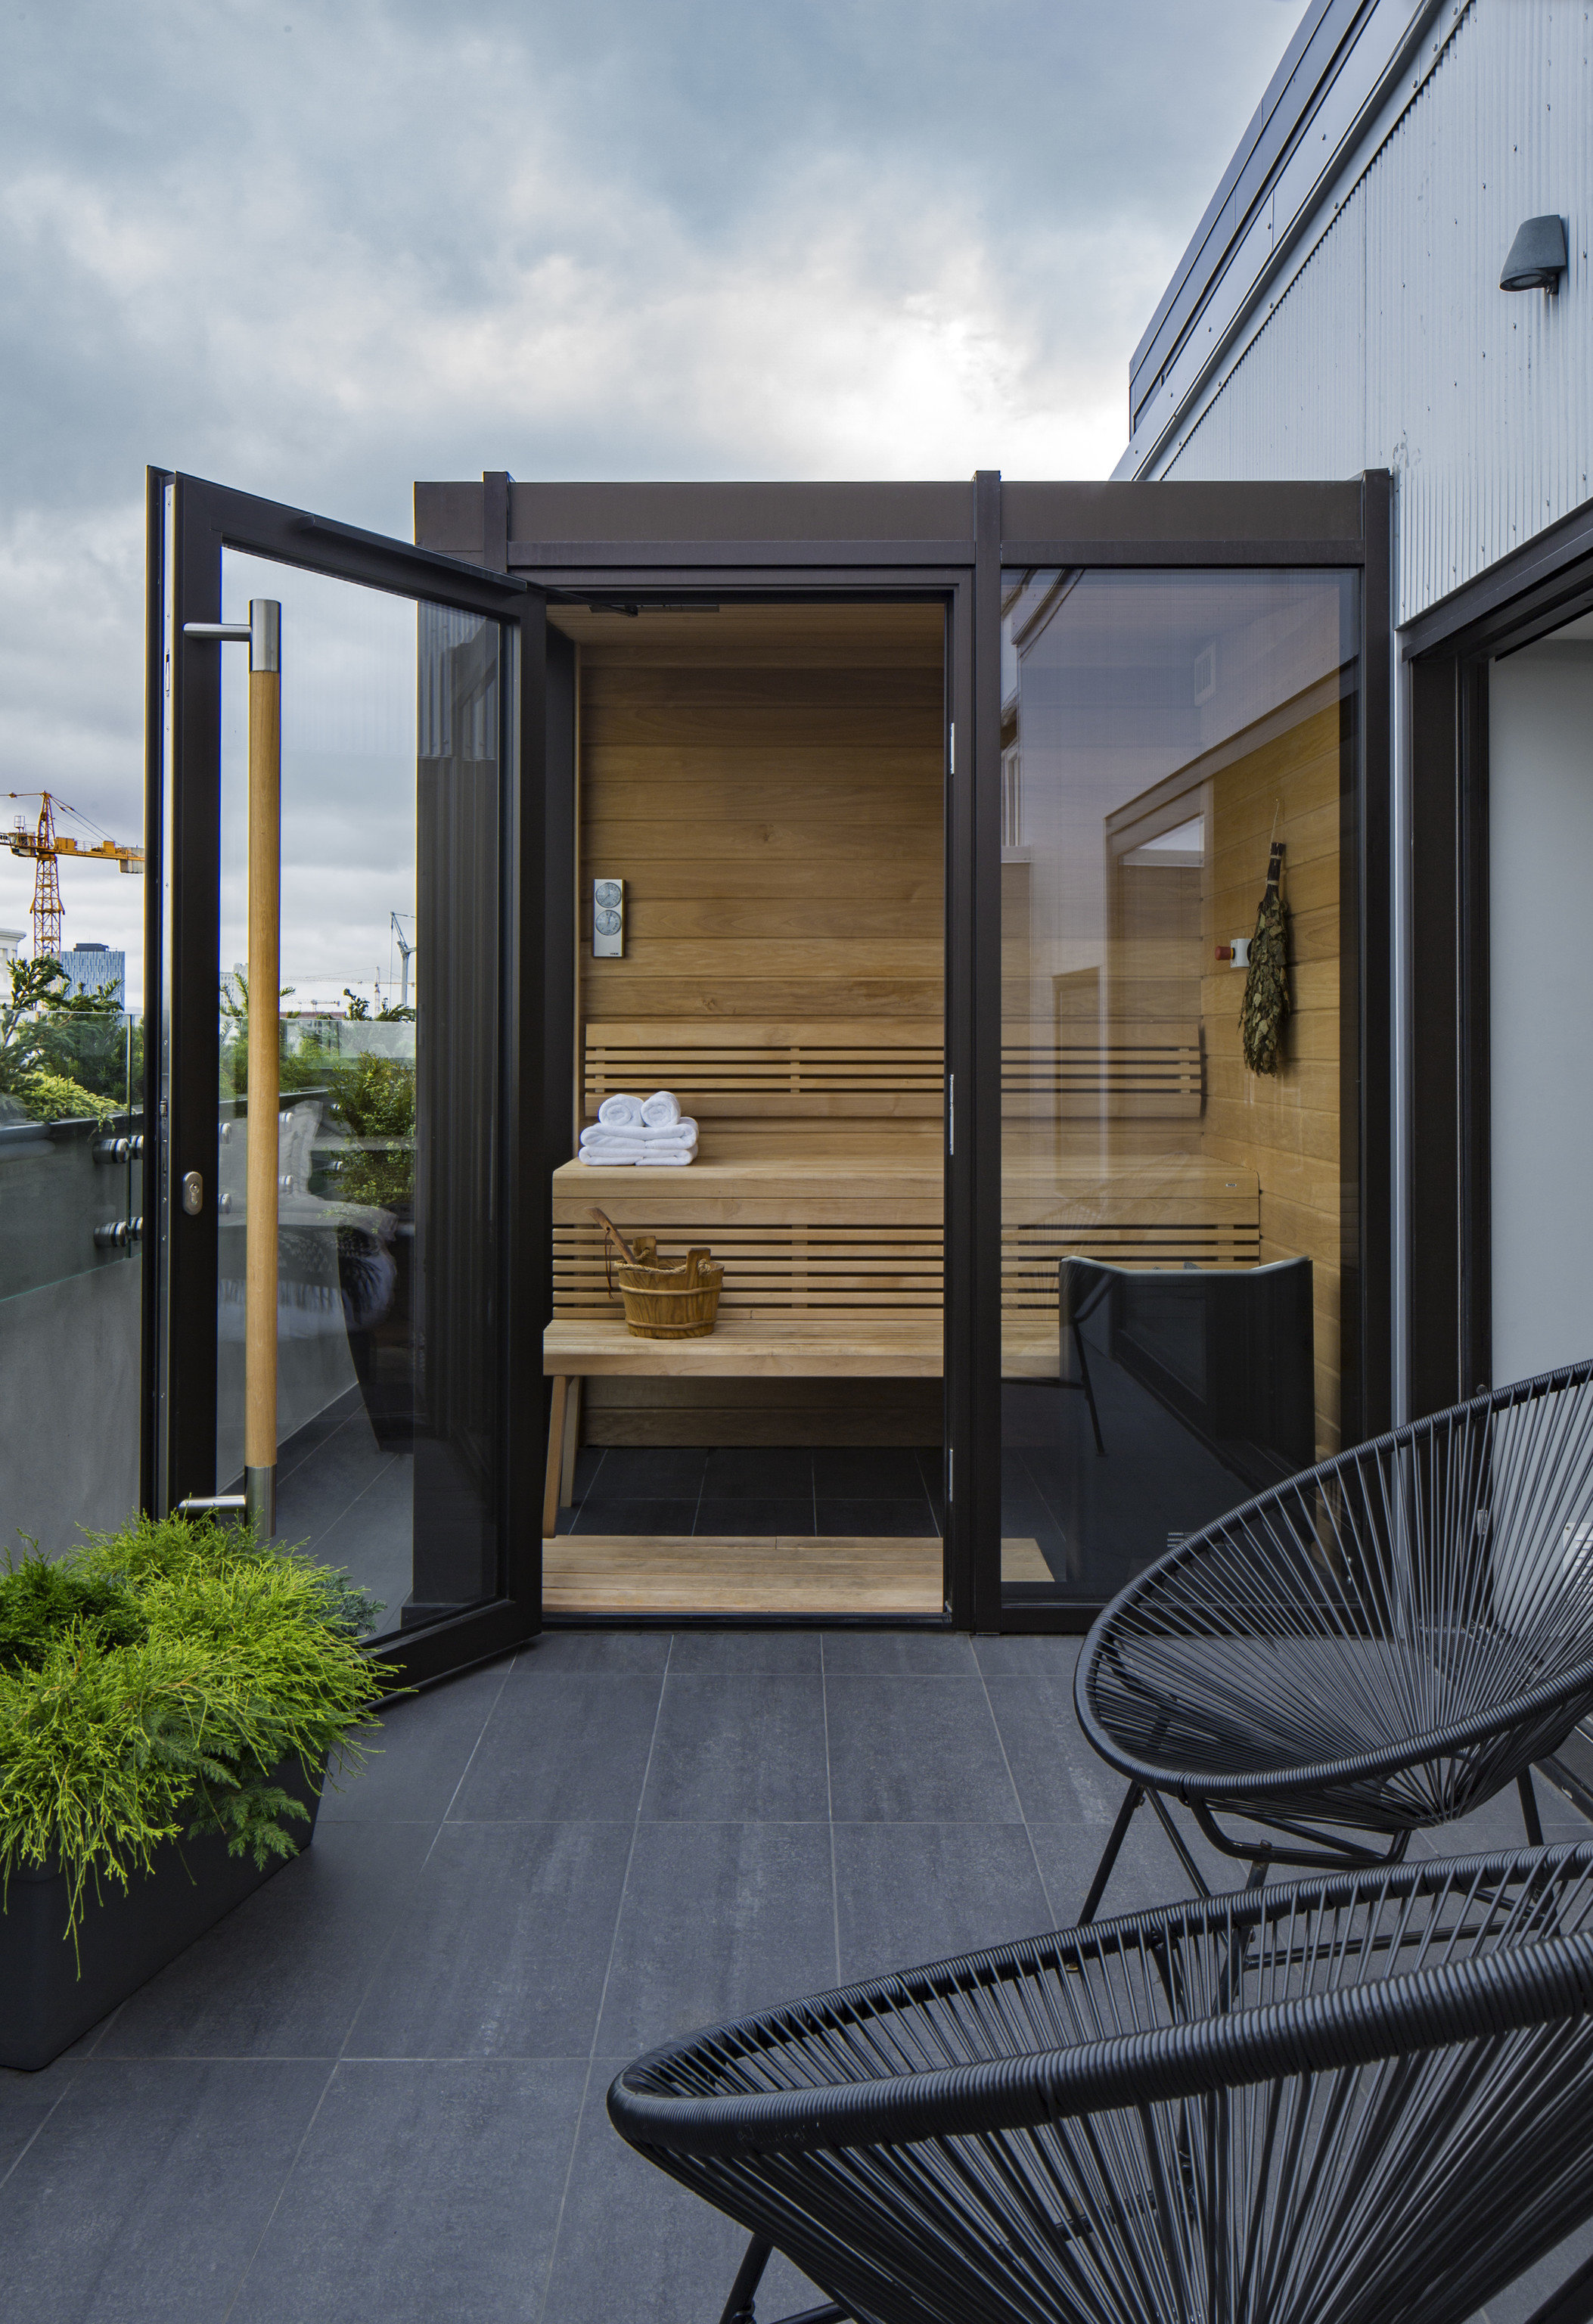 Boutique Hotels Hotels Iceland Reykjavík house door home window facade outdoor structure